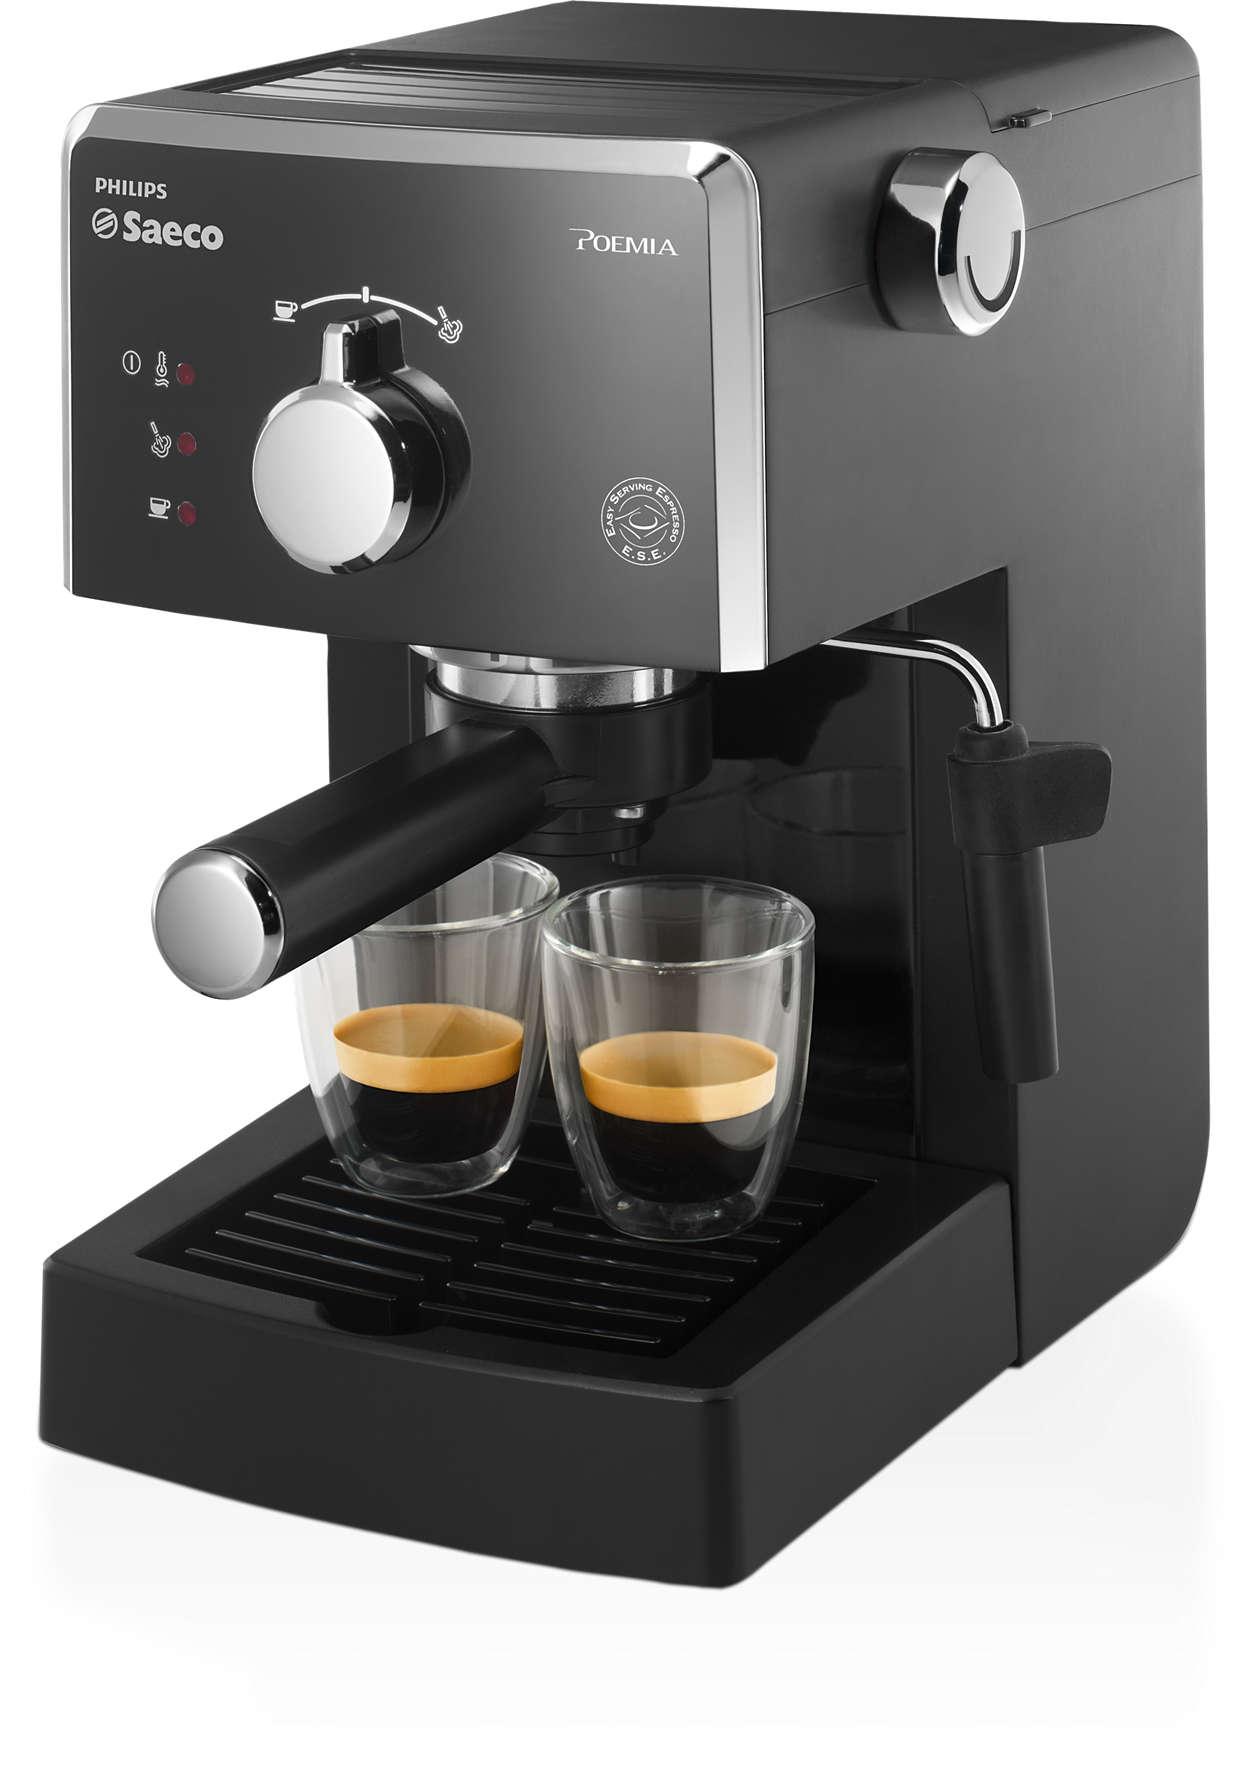 Authentic Italian Espresso every day